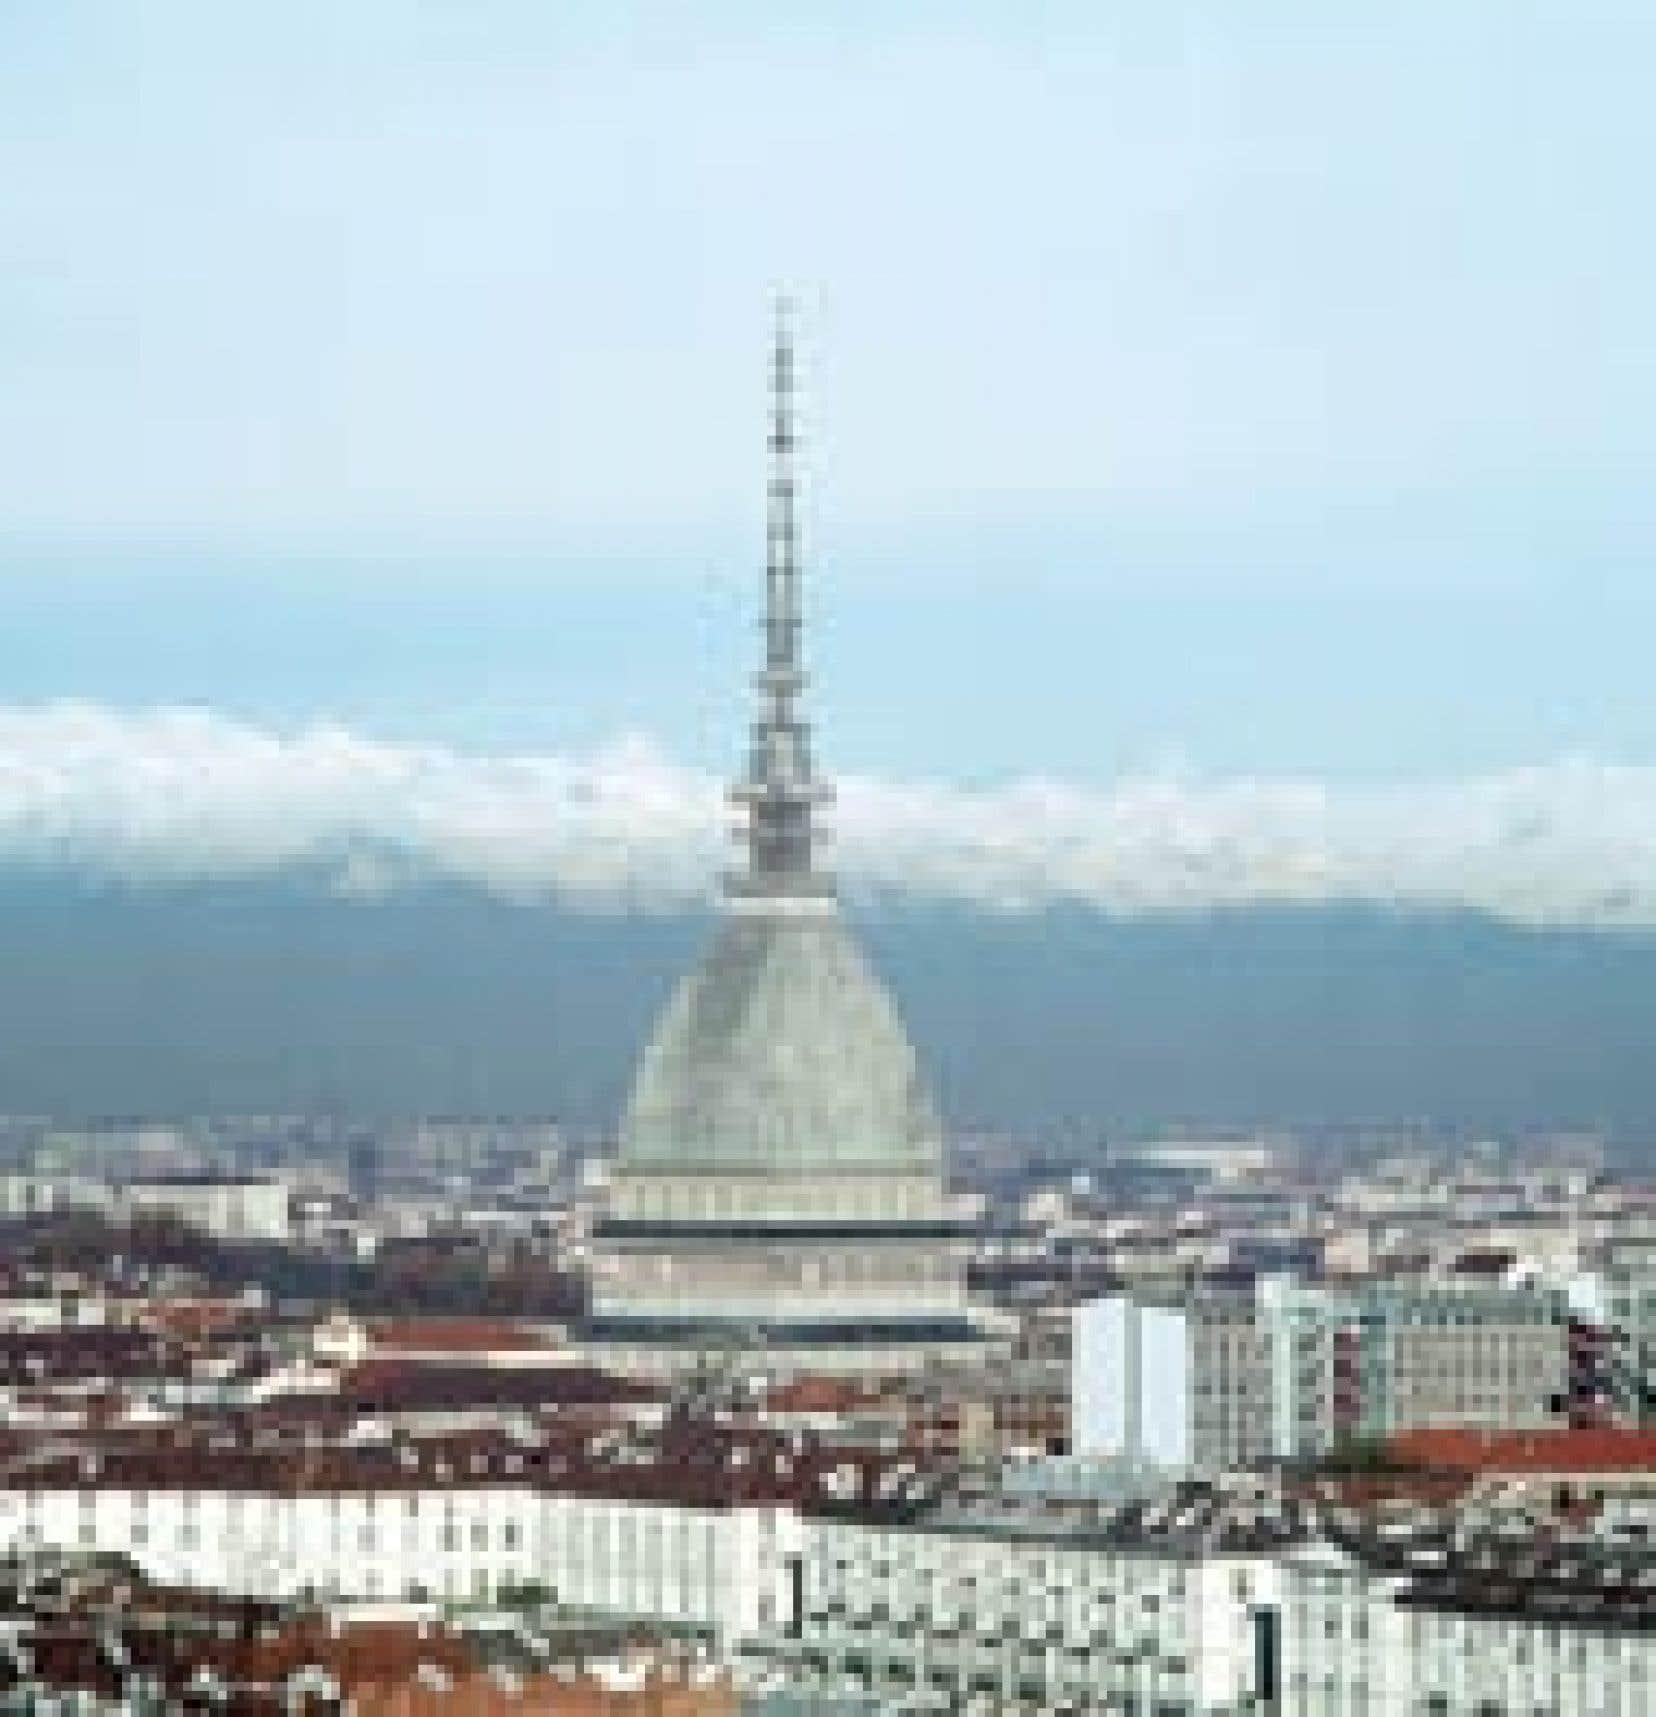 Source Torino 2006